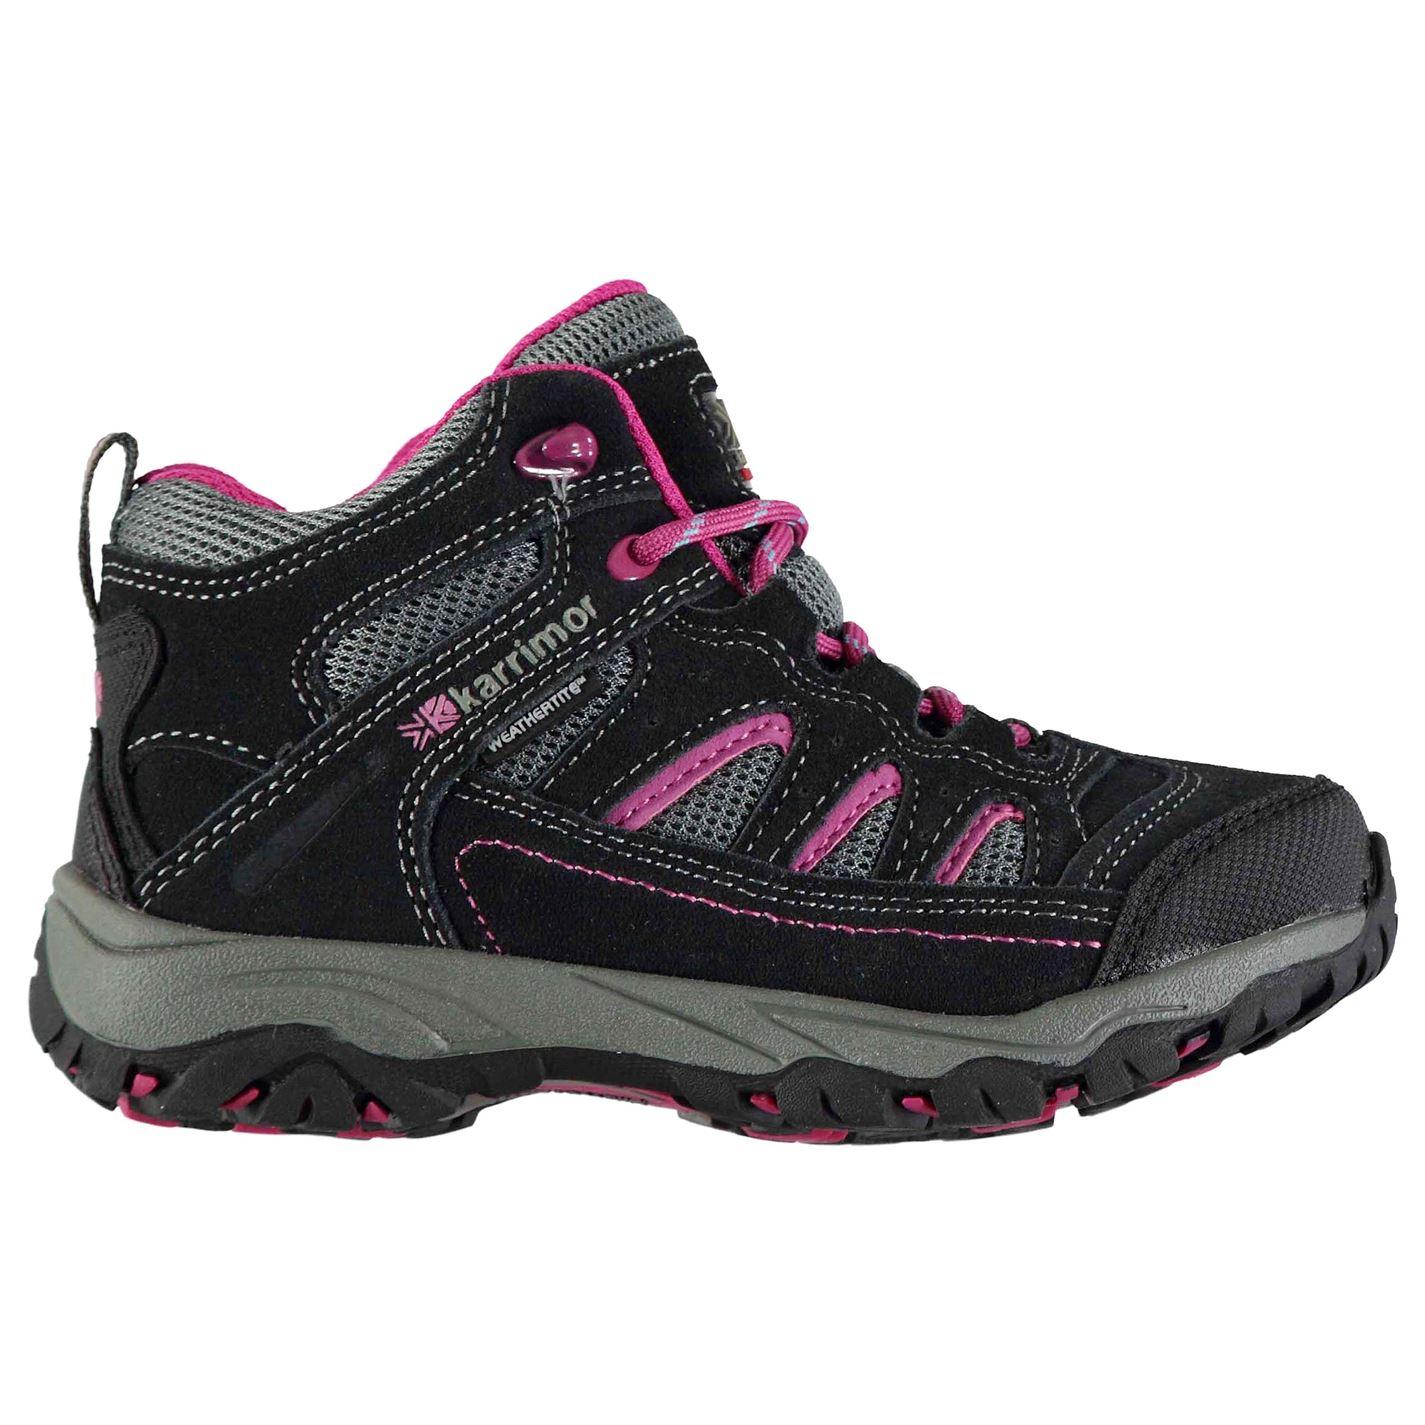 Karrimor Mount Mid Childrens Walking Boots